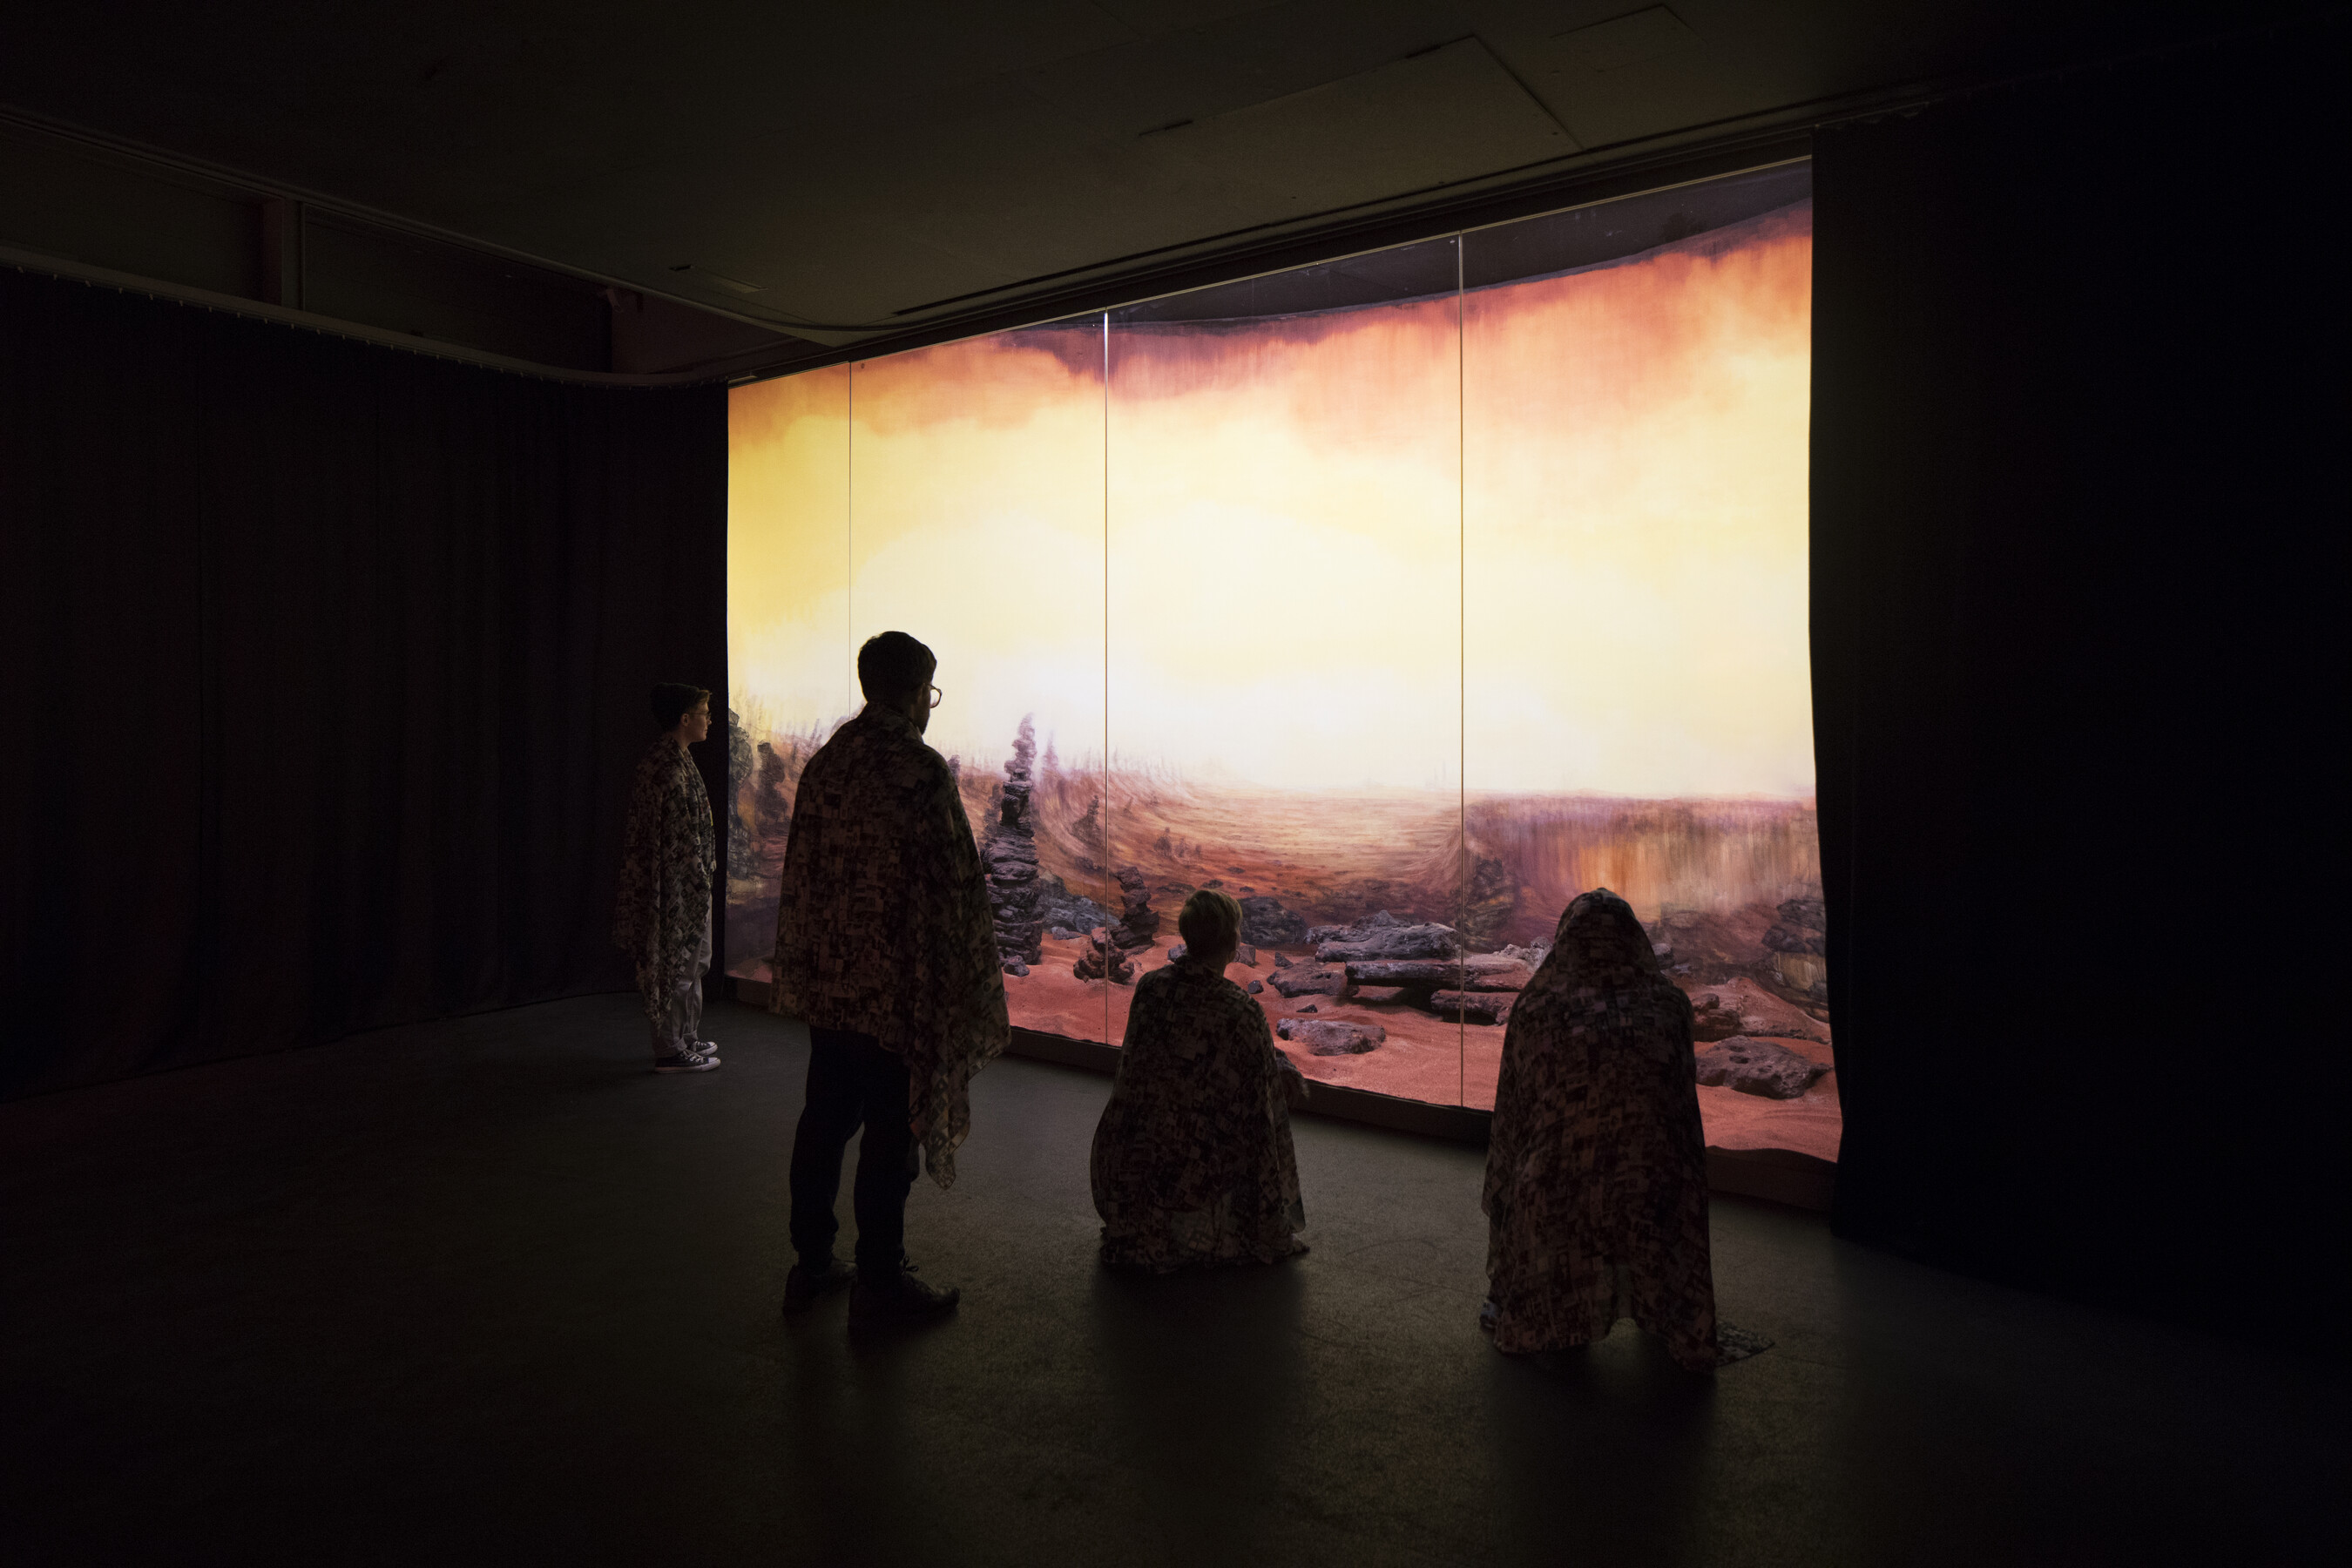 Dominique Gonzalez-Foerster, Martian Dreams Ensemble, Ausstellungsansicht, ©GfZK